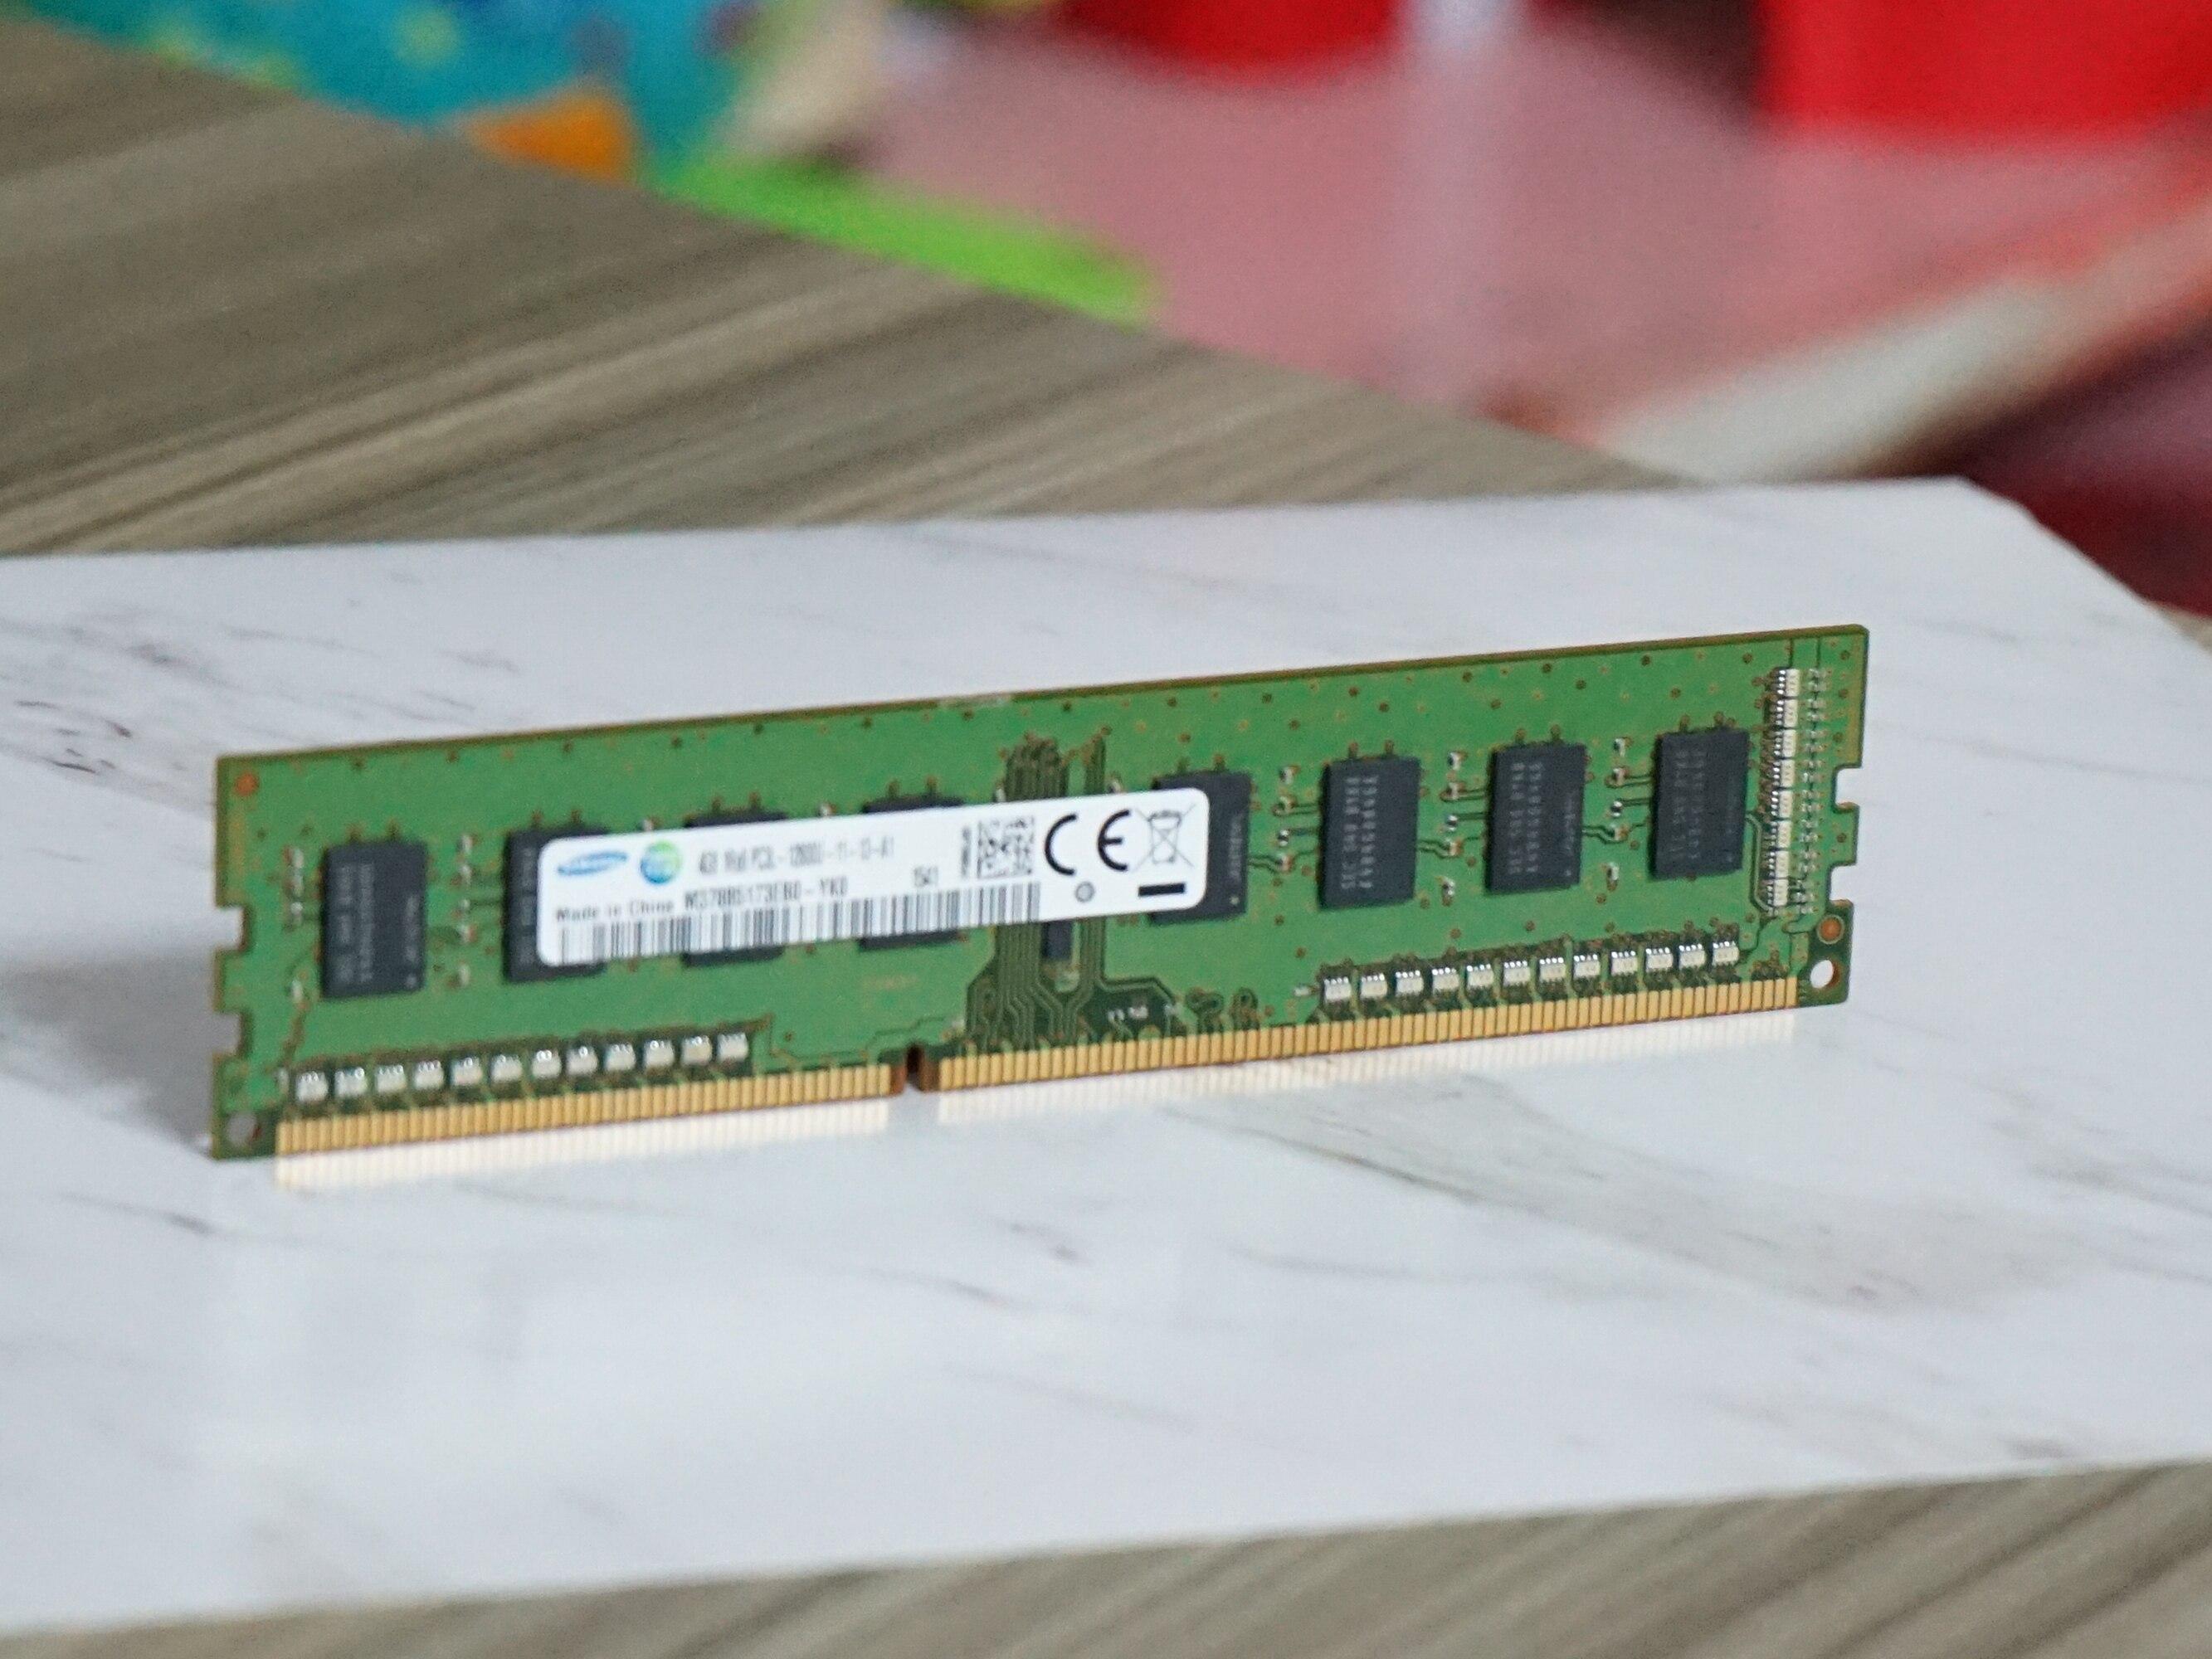 Samsung 2GB/4GB/8GB DDR3 Desktop RAM with 333Mhz/1600Mhz Memory Speed 2